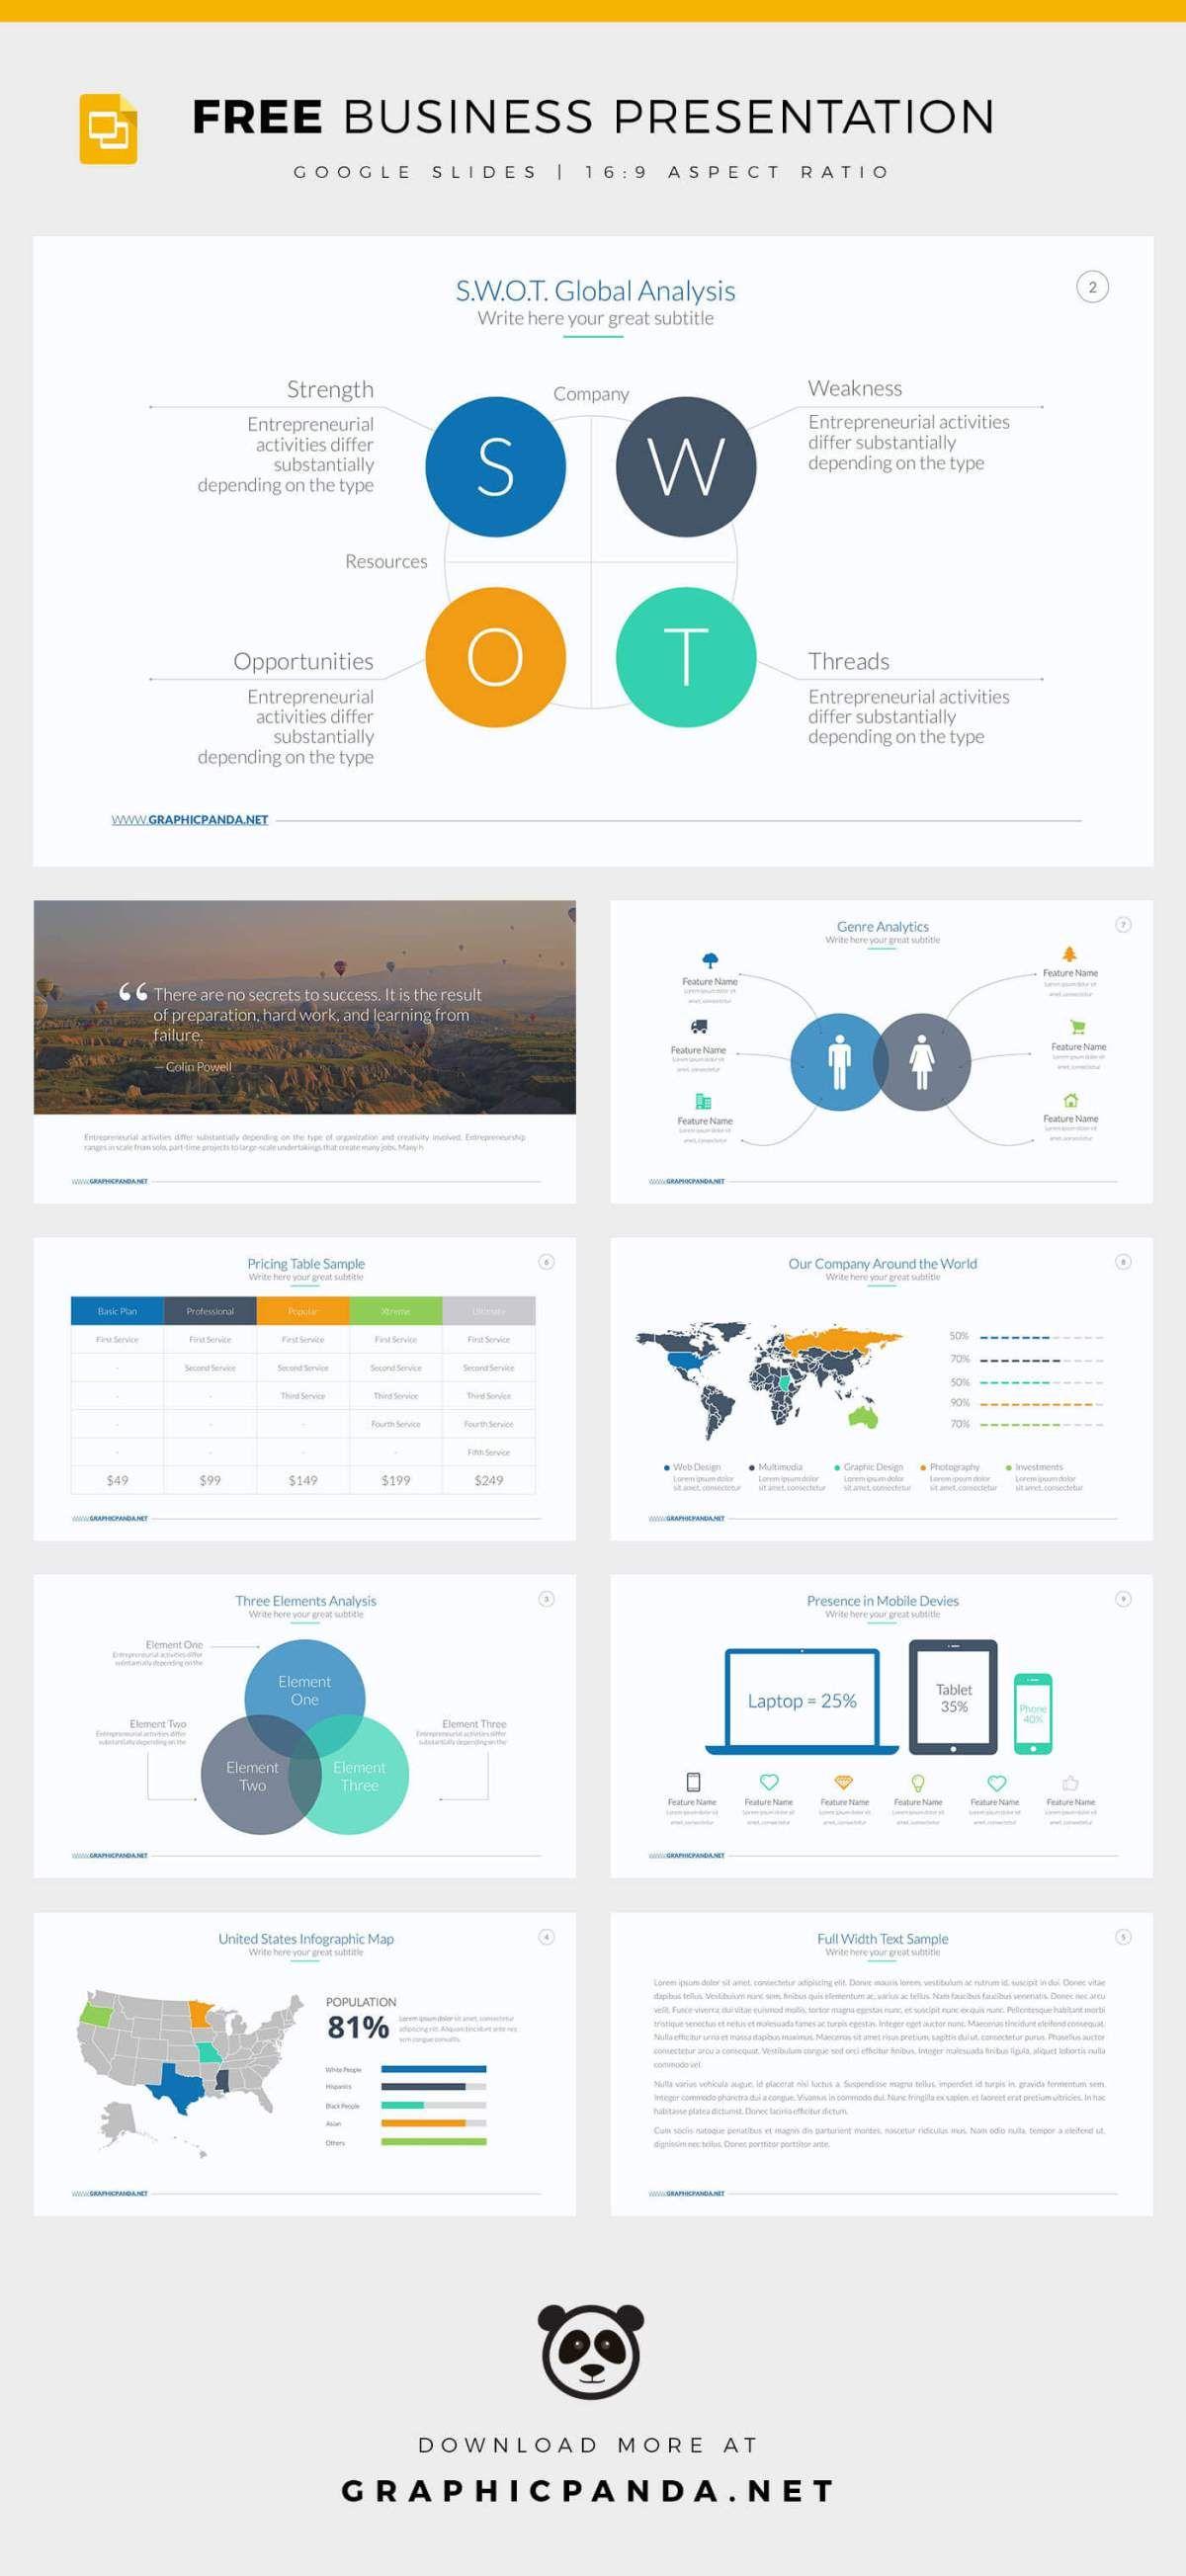 free google slides business powerpoint templates. Black Bedroom Furniture Sets. Home Design Ideas